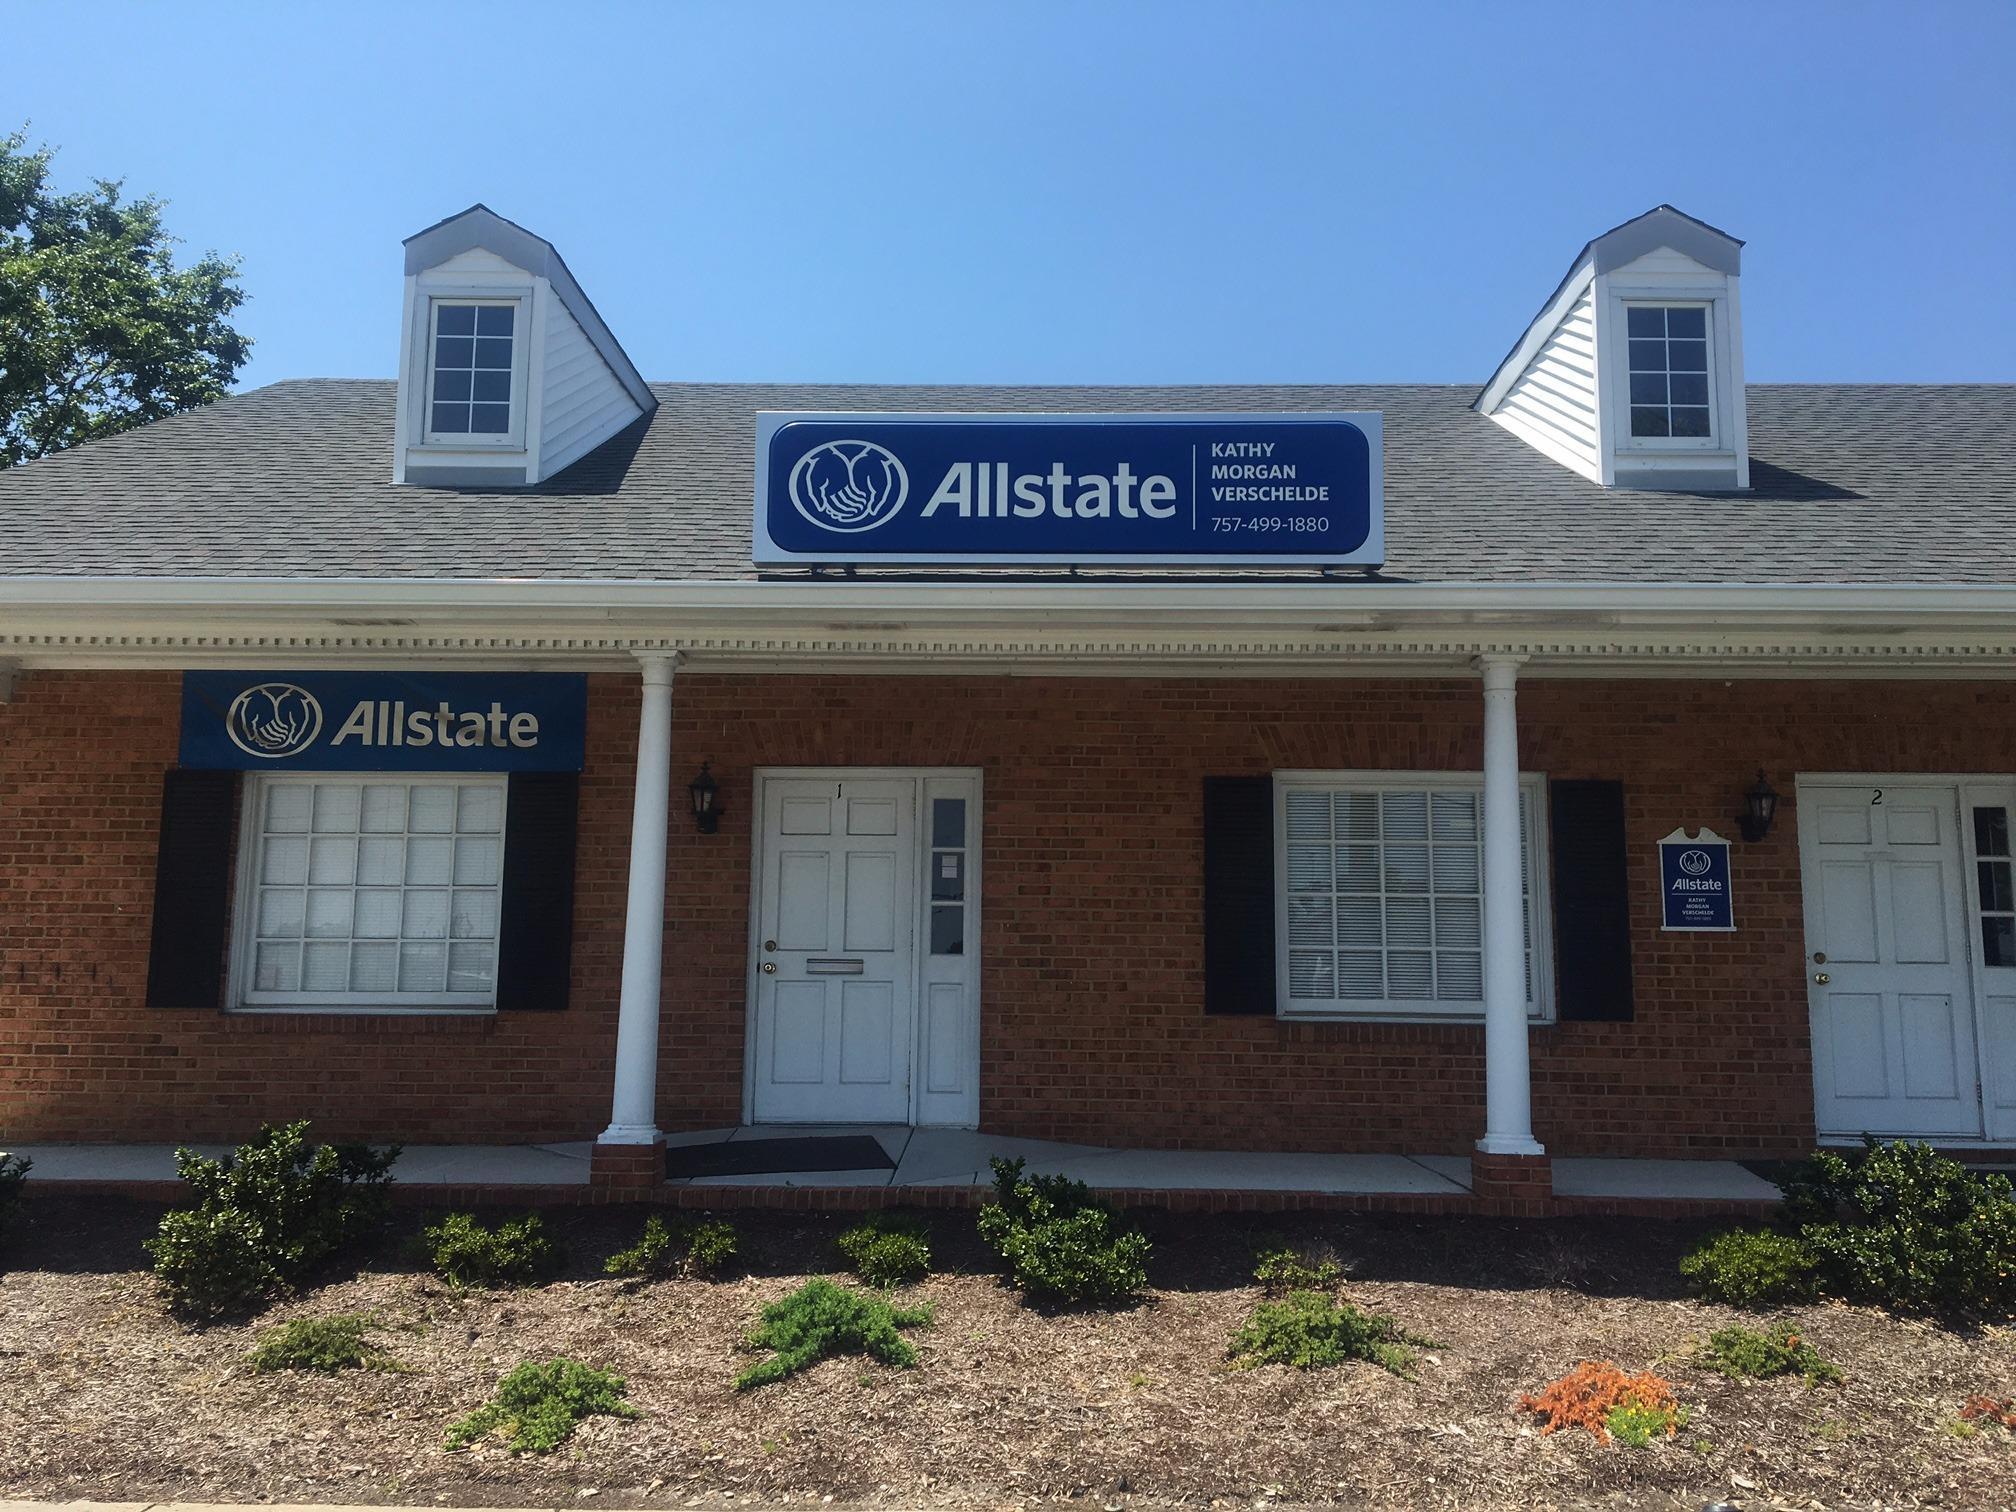 Allstate Insurance Agent: Kathy Verschelde image 5